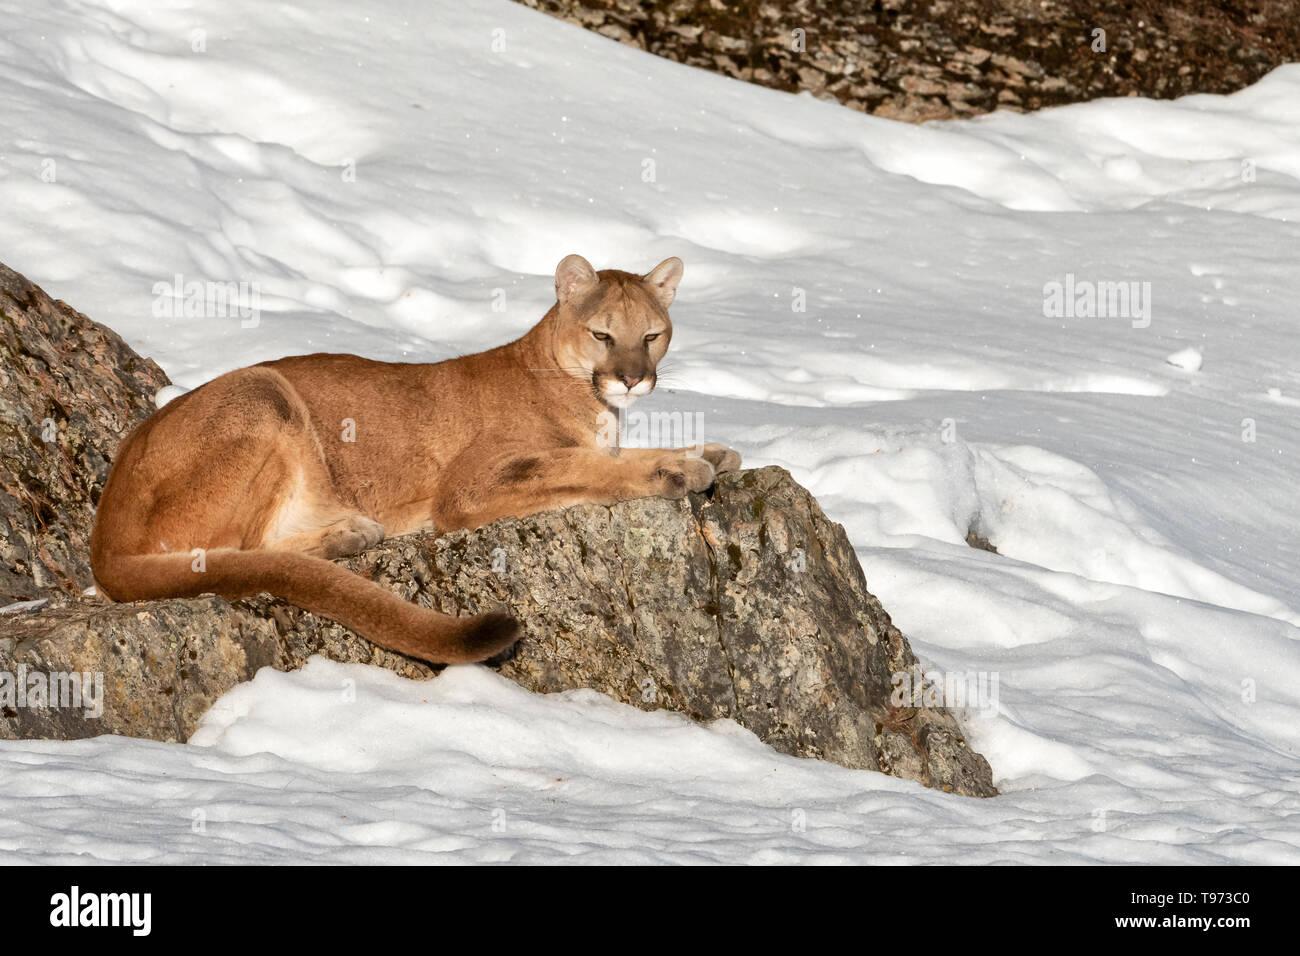 North America; United States; Montana;  Wildlife; Mammals; Predators; Felines; Mountain Lion; Felis concolor - Stock Image